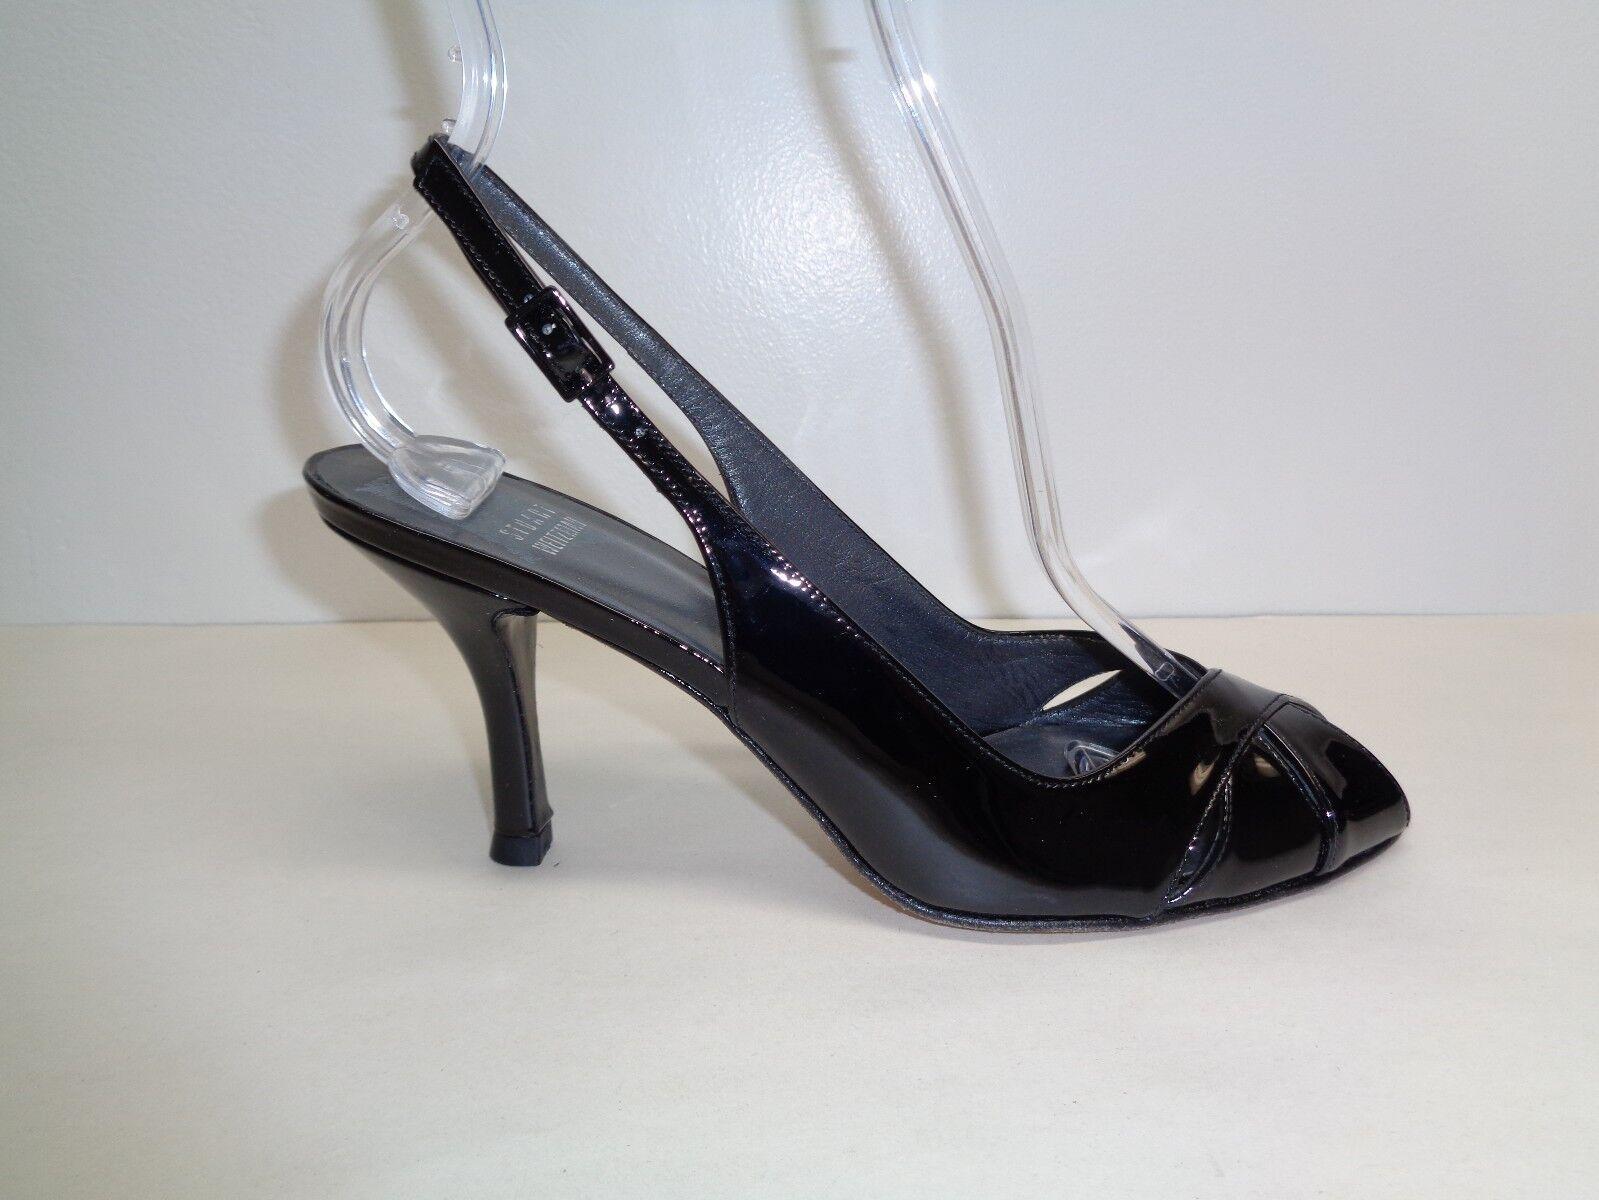 Stuart Weitzman Size 10 M PEEKAPOO Patent Leather Sandals New Donna Shoes